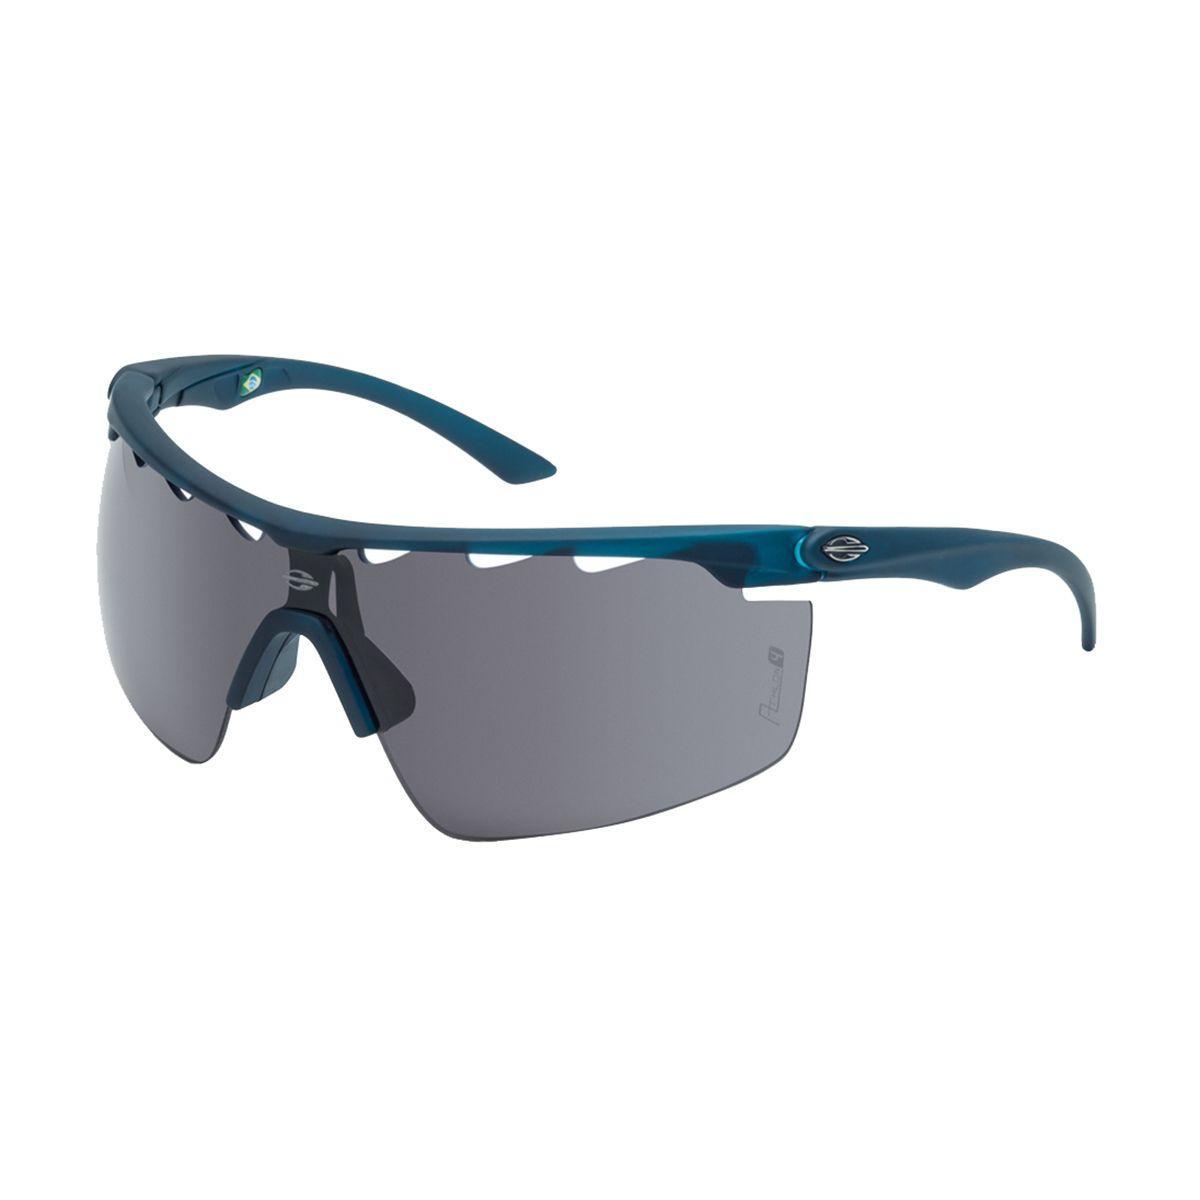 Óculos De Sol Athlon Azul Lente Cinza Básica M0042 Mormaii R  299,00 à  vista. Adicionar à sacola 59b0476f39